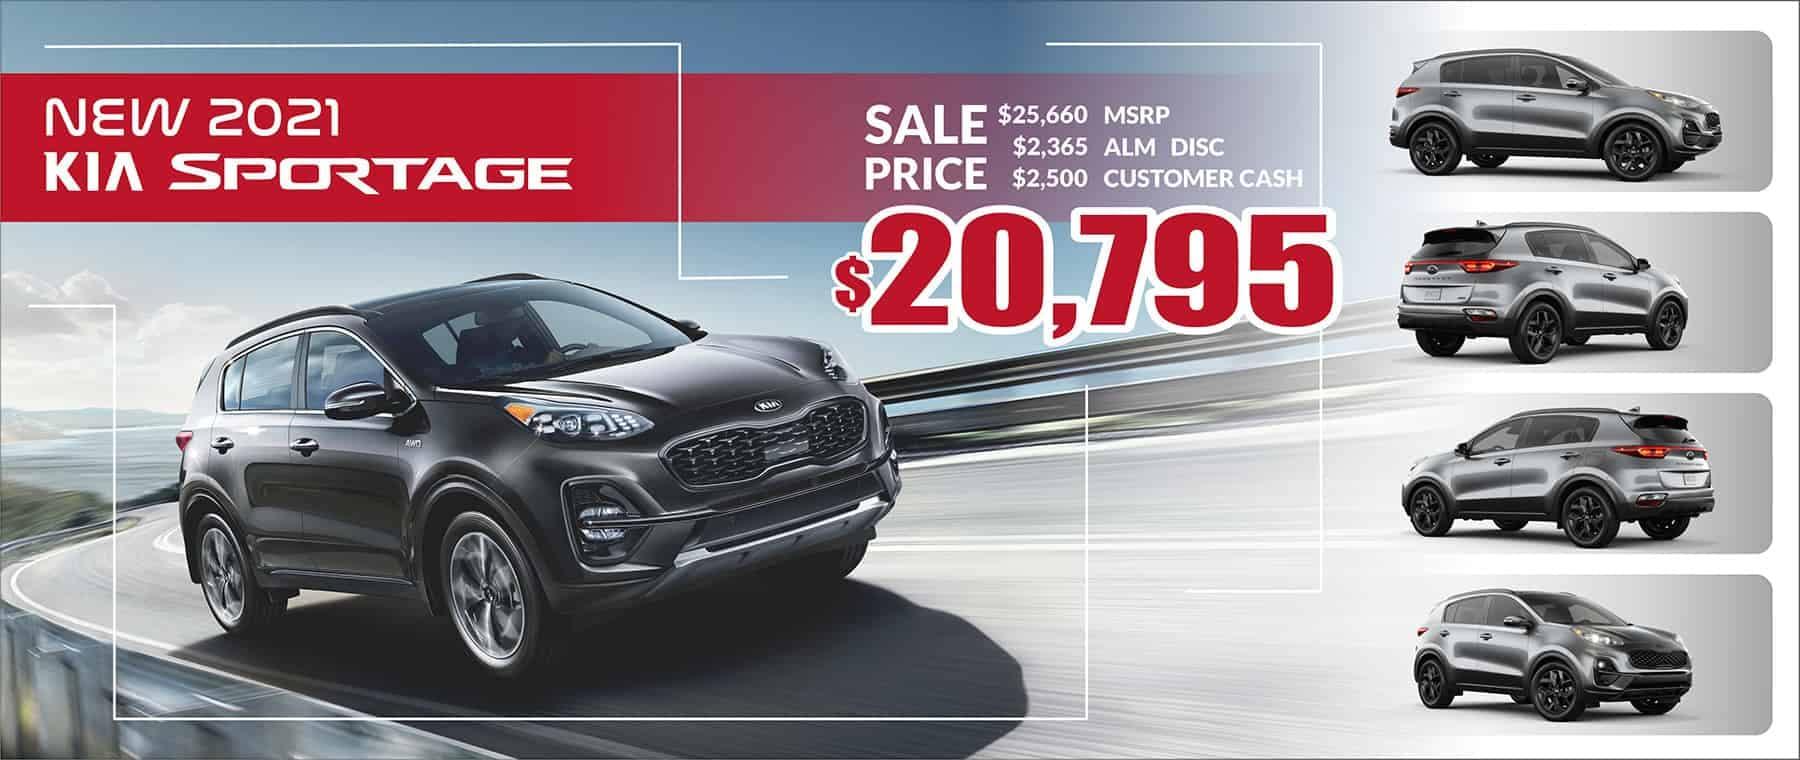 2021 Kia Sportage Sale Price $20,795